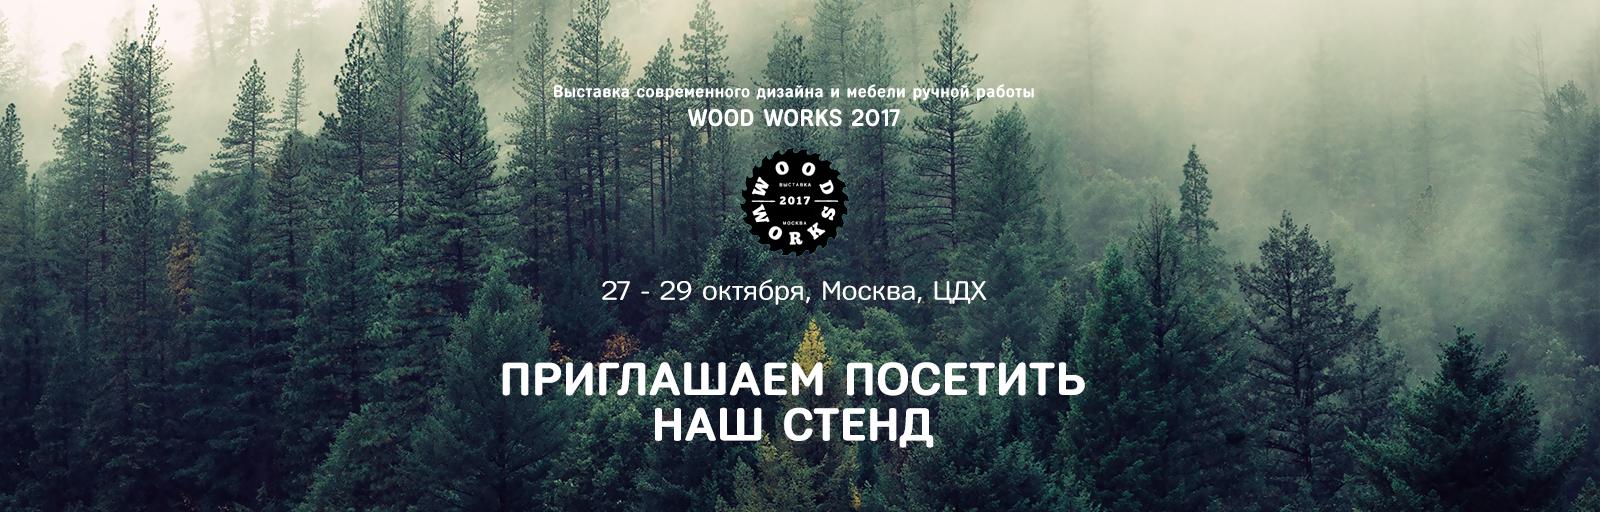 банер-woodworks